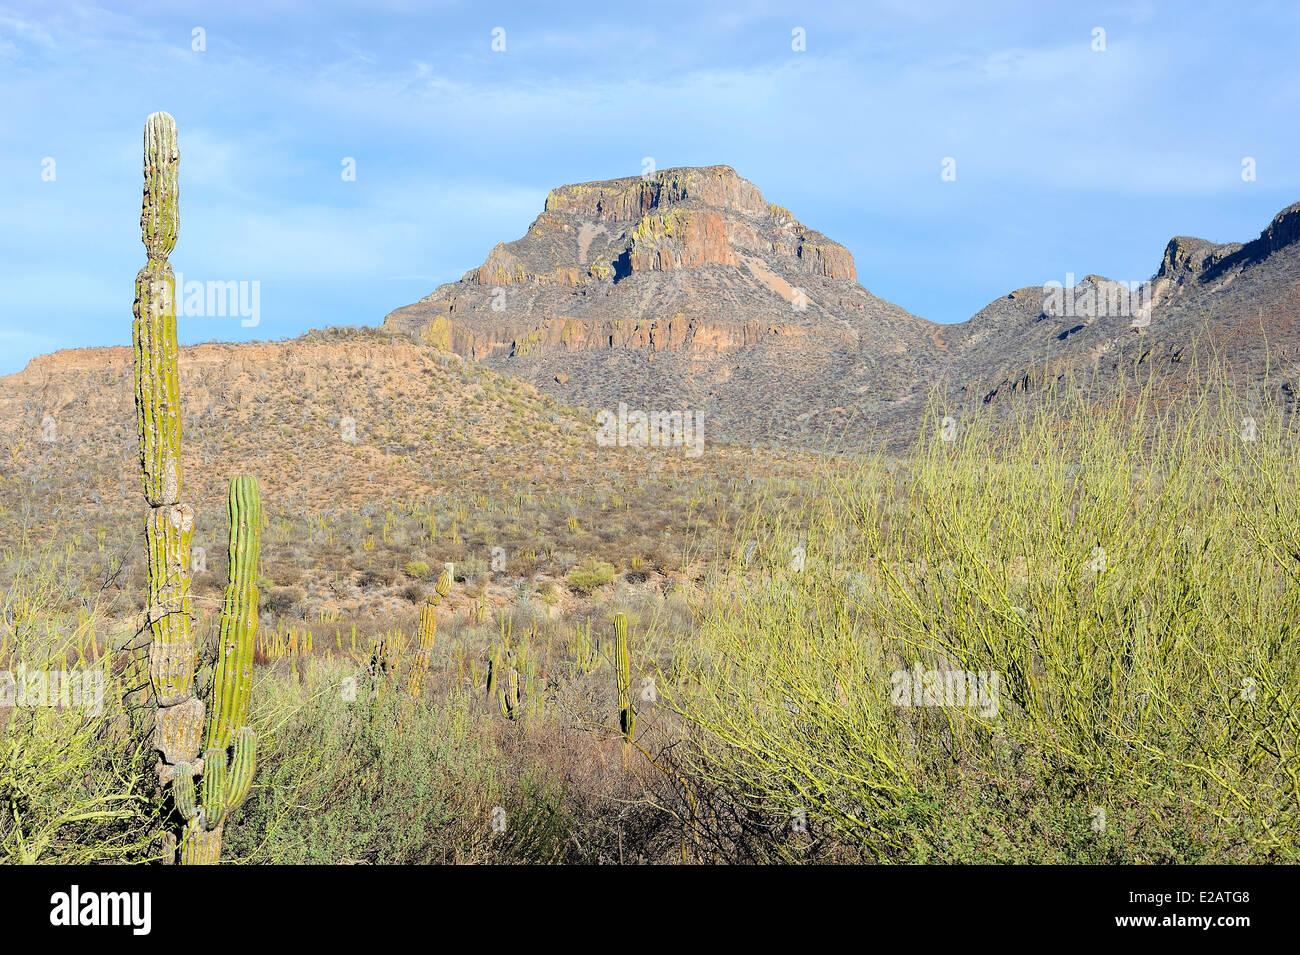 Mexico, Baja California Sur State, Loreto region - Stock Image